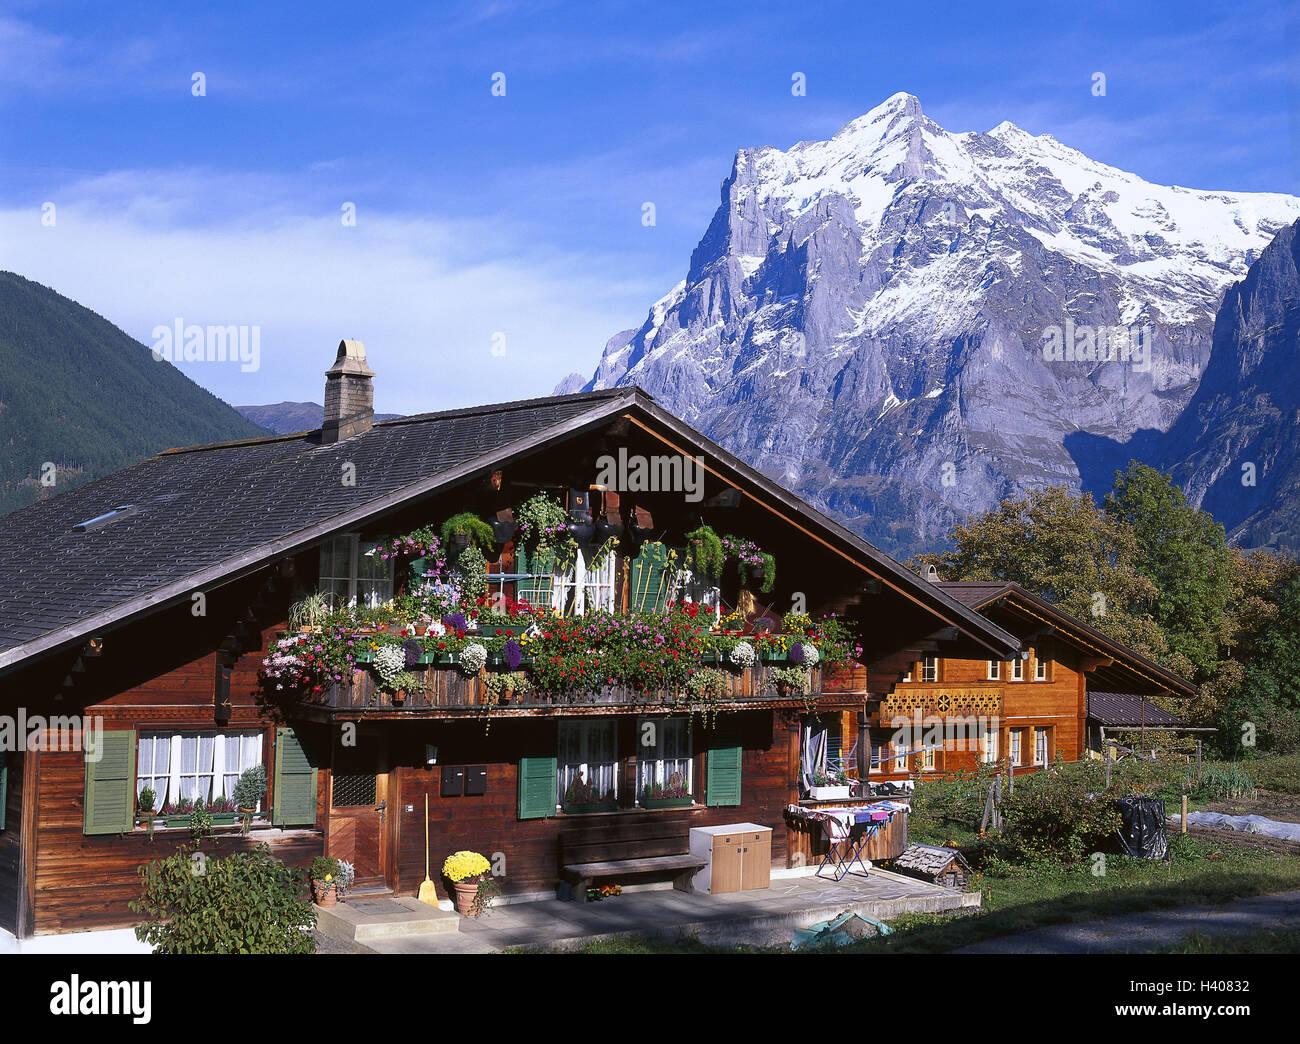 Decorazioni Per Casa Montagna : La svizzera loberland bernese grindelwald agriturismo meteo